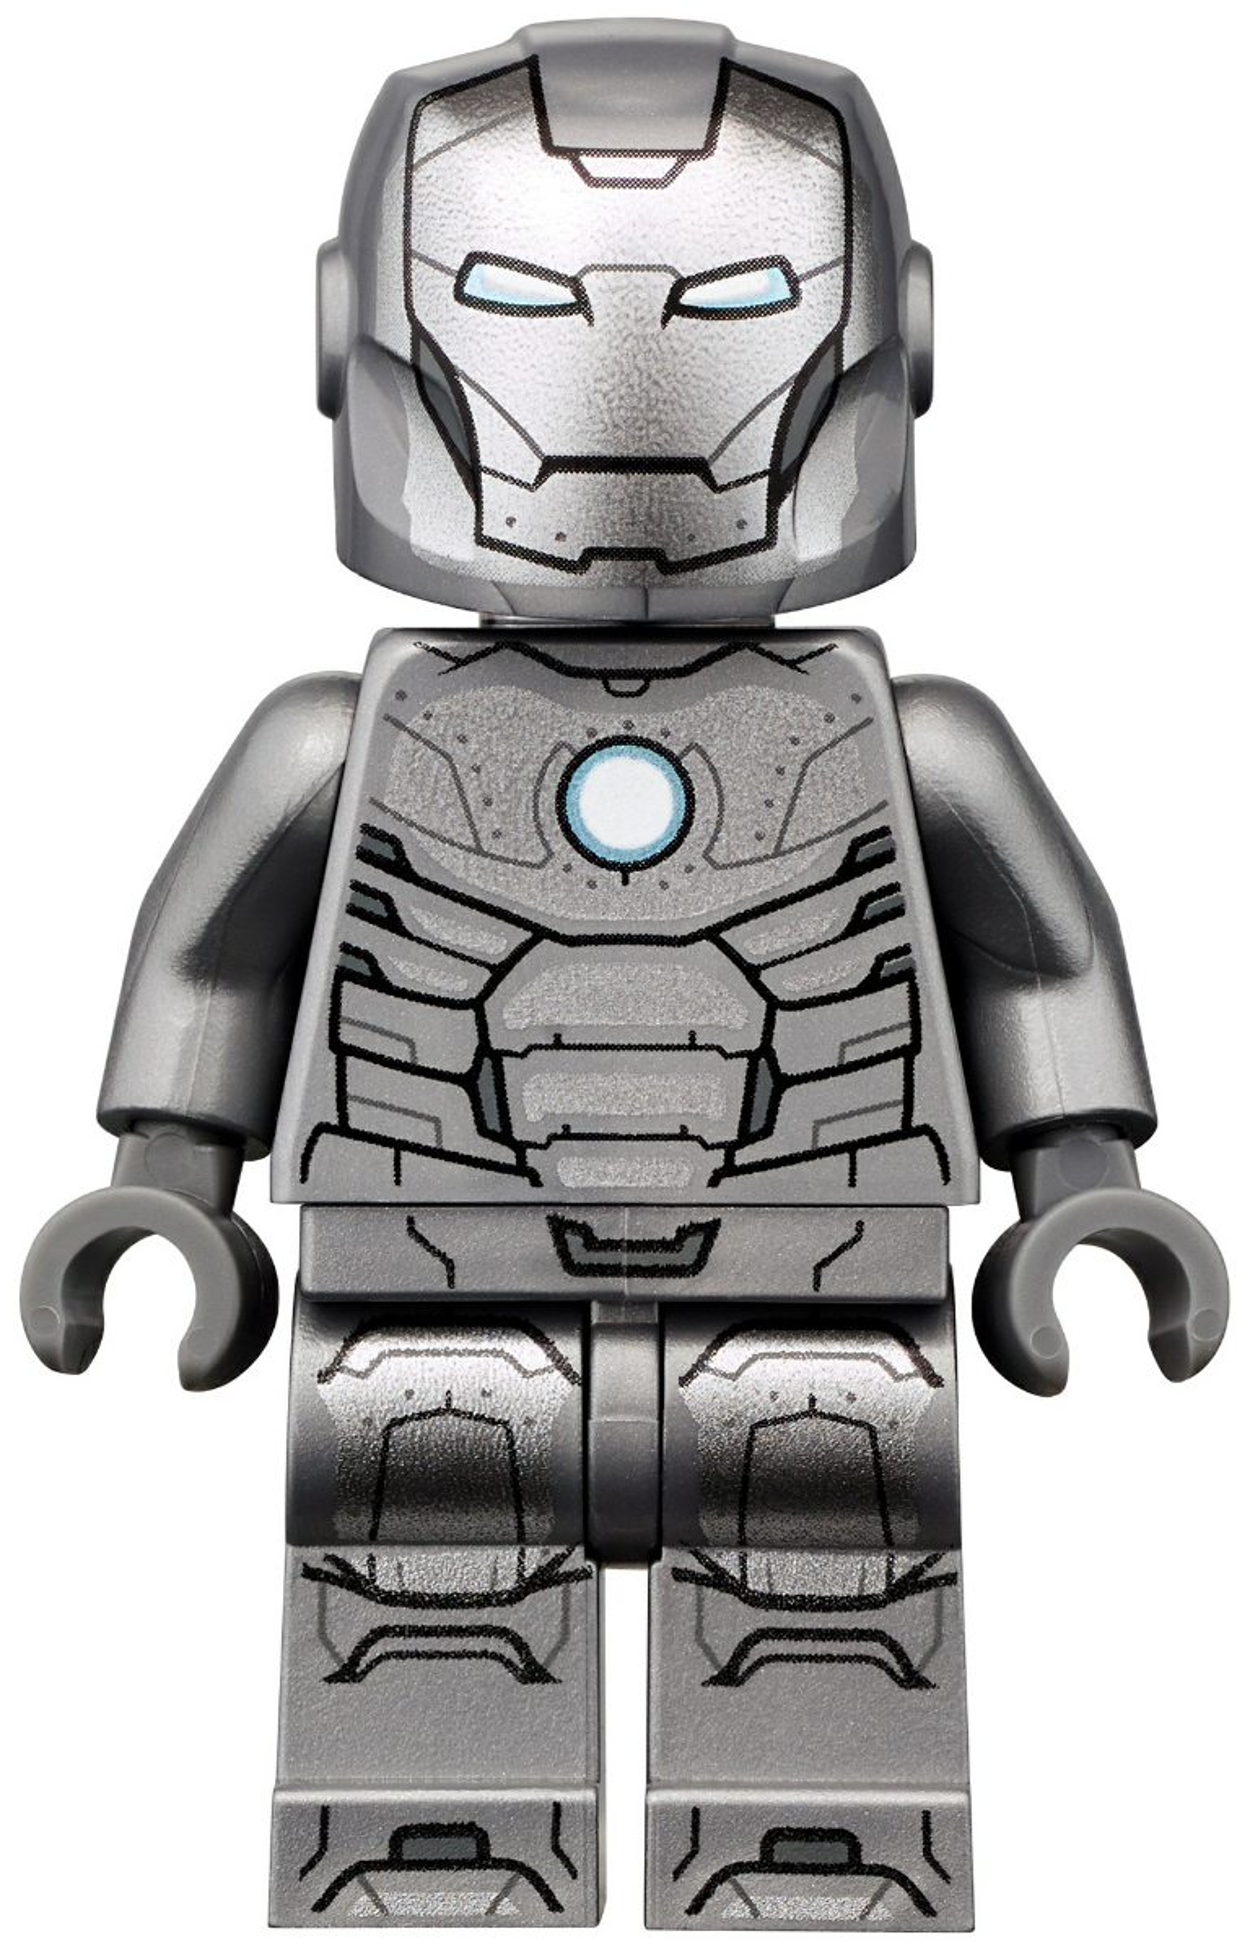 Minifigure Pad Printing By Brick Mode Blue Custom Lego Invincible Iron Man